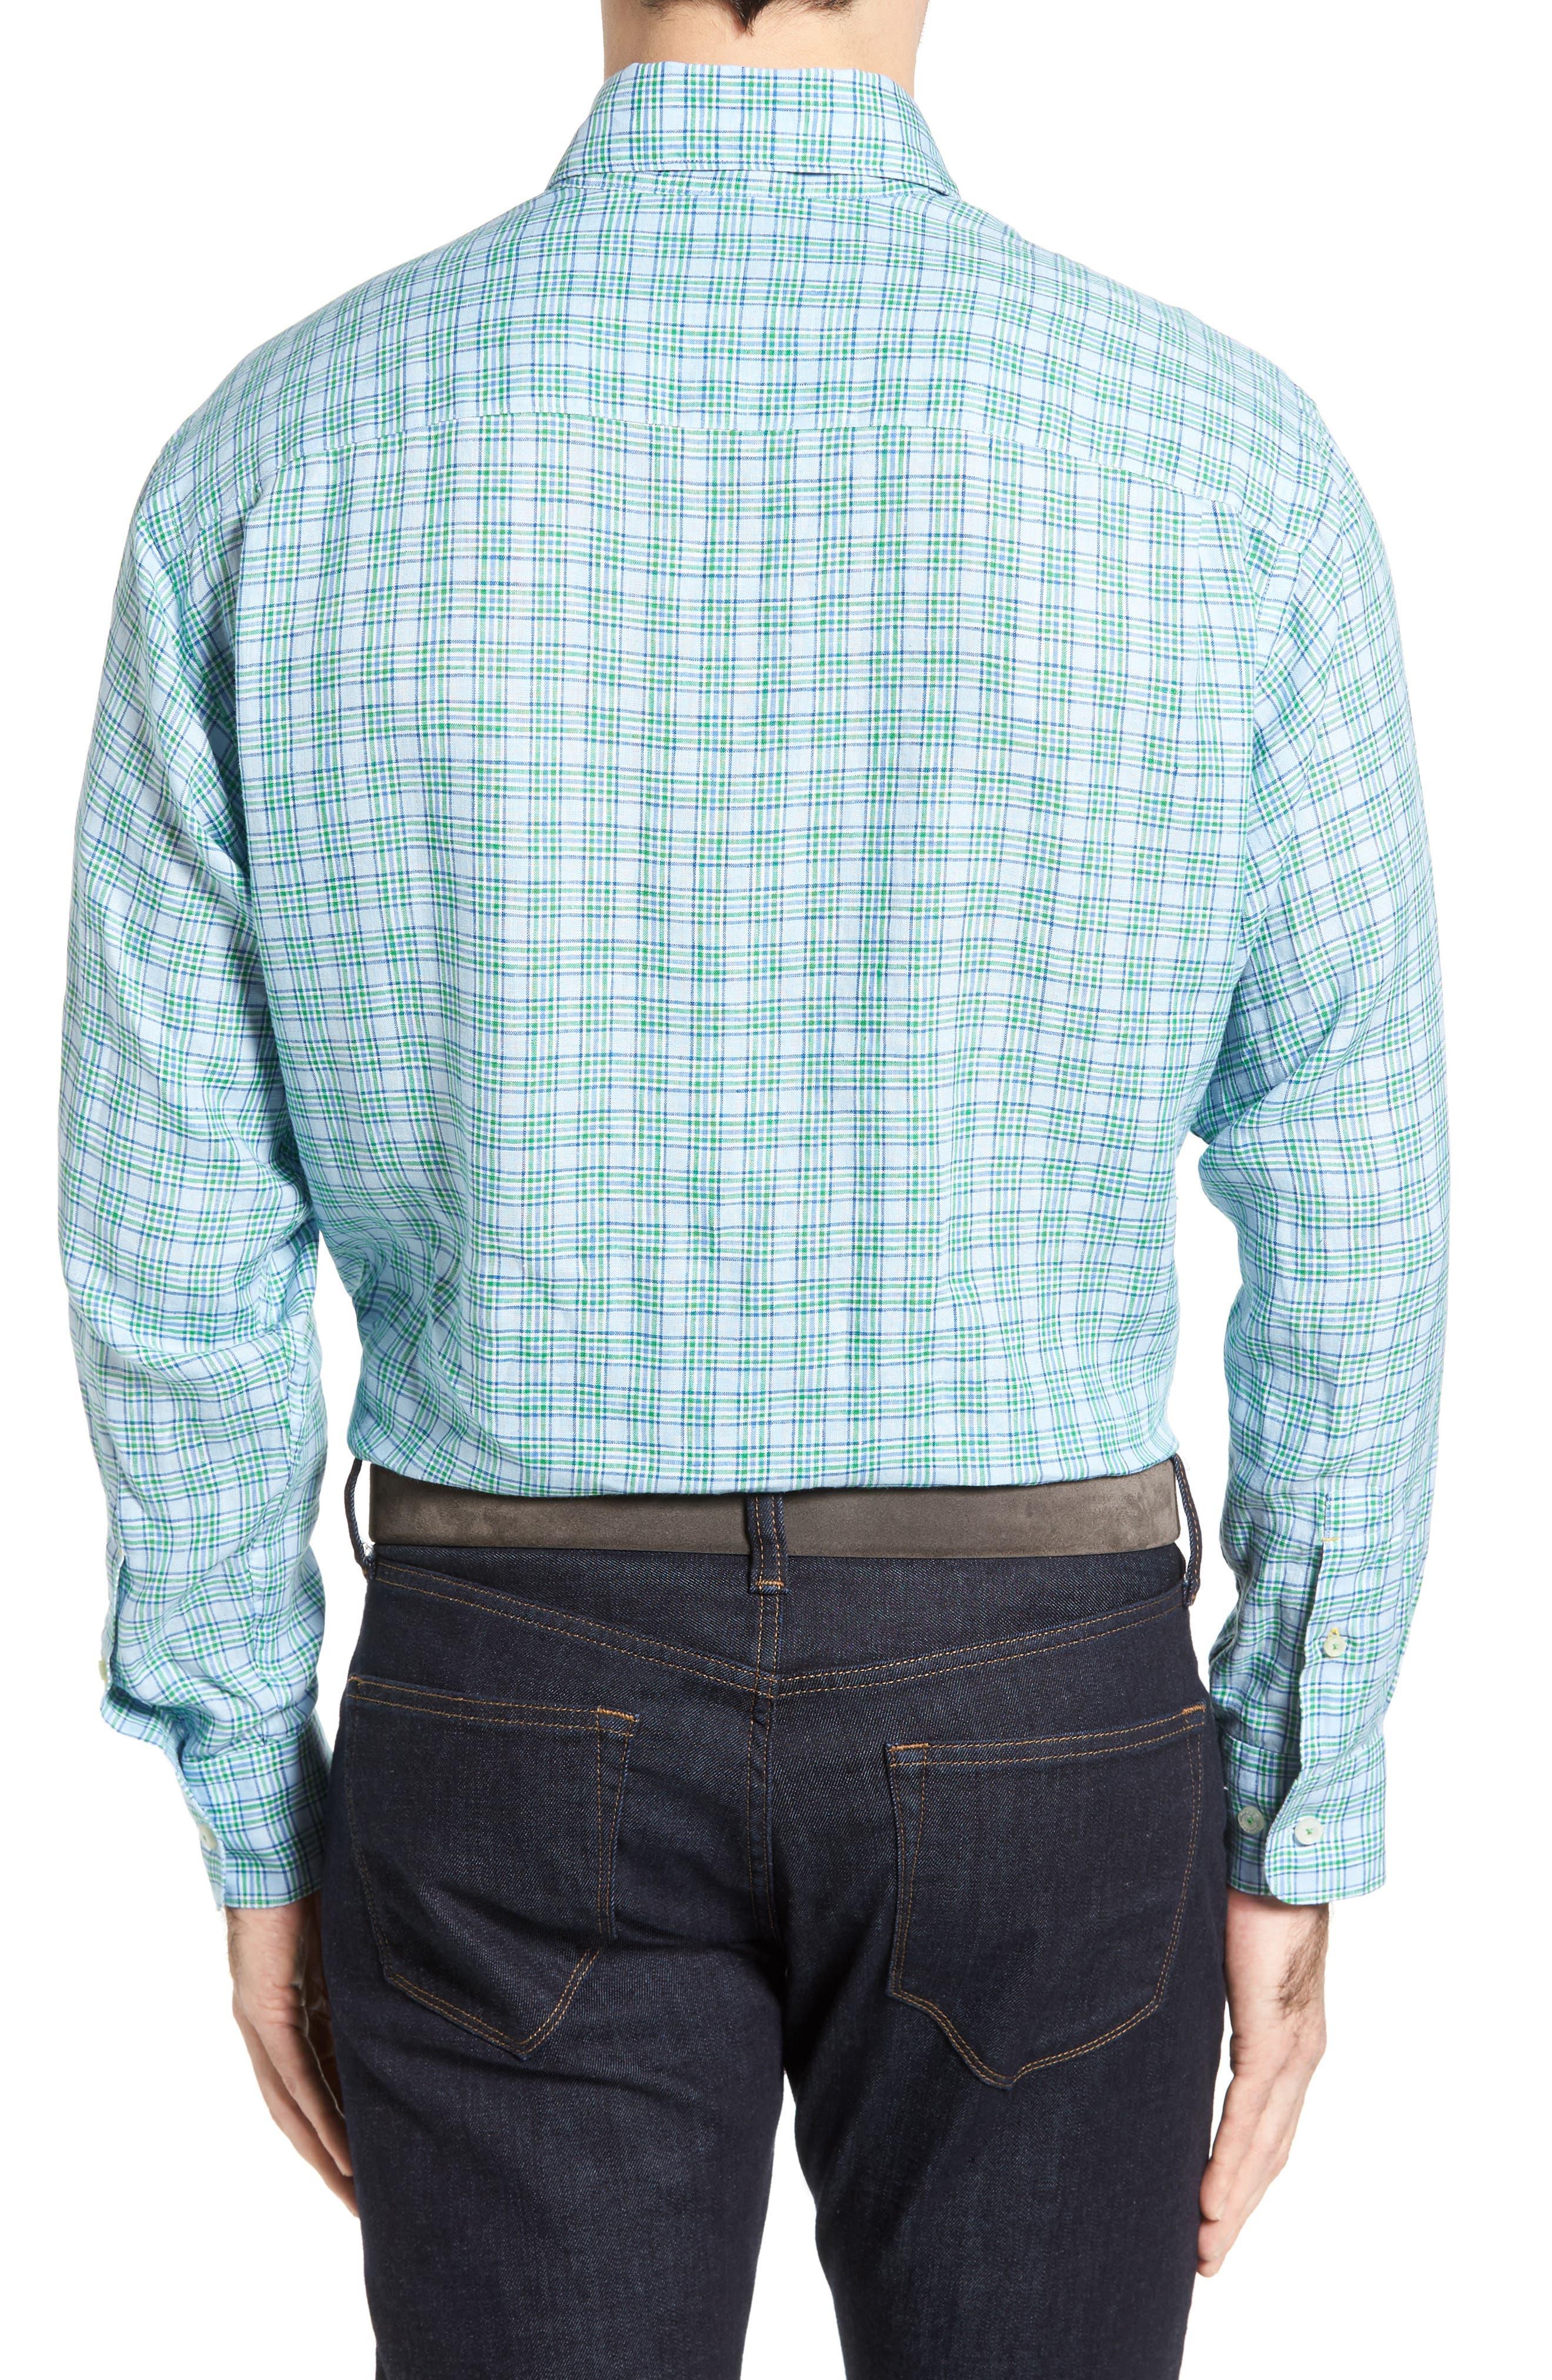 Anderson Classic Fit Sport Shirt,                             Alternate thumbnail 2, color,                             449